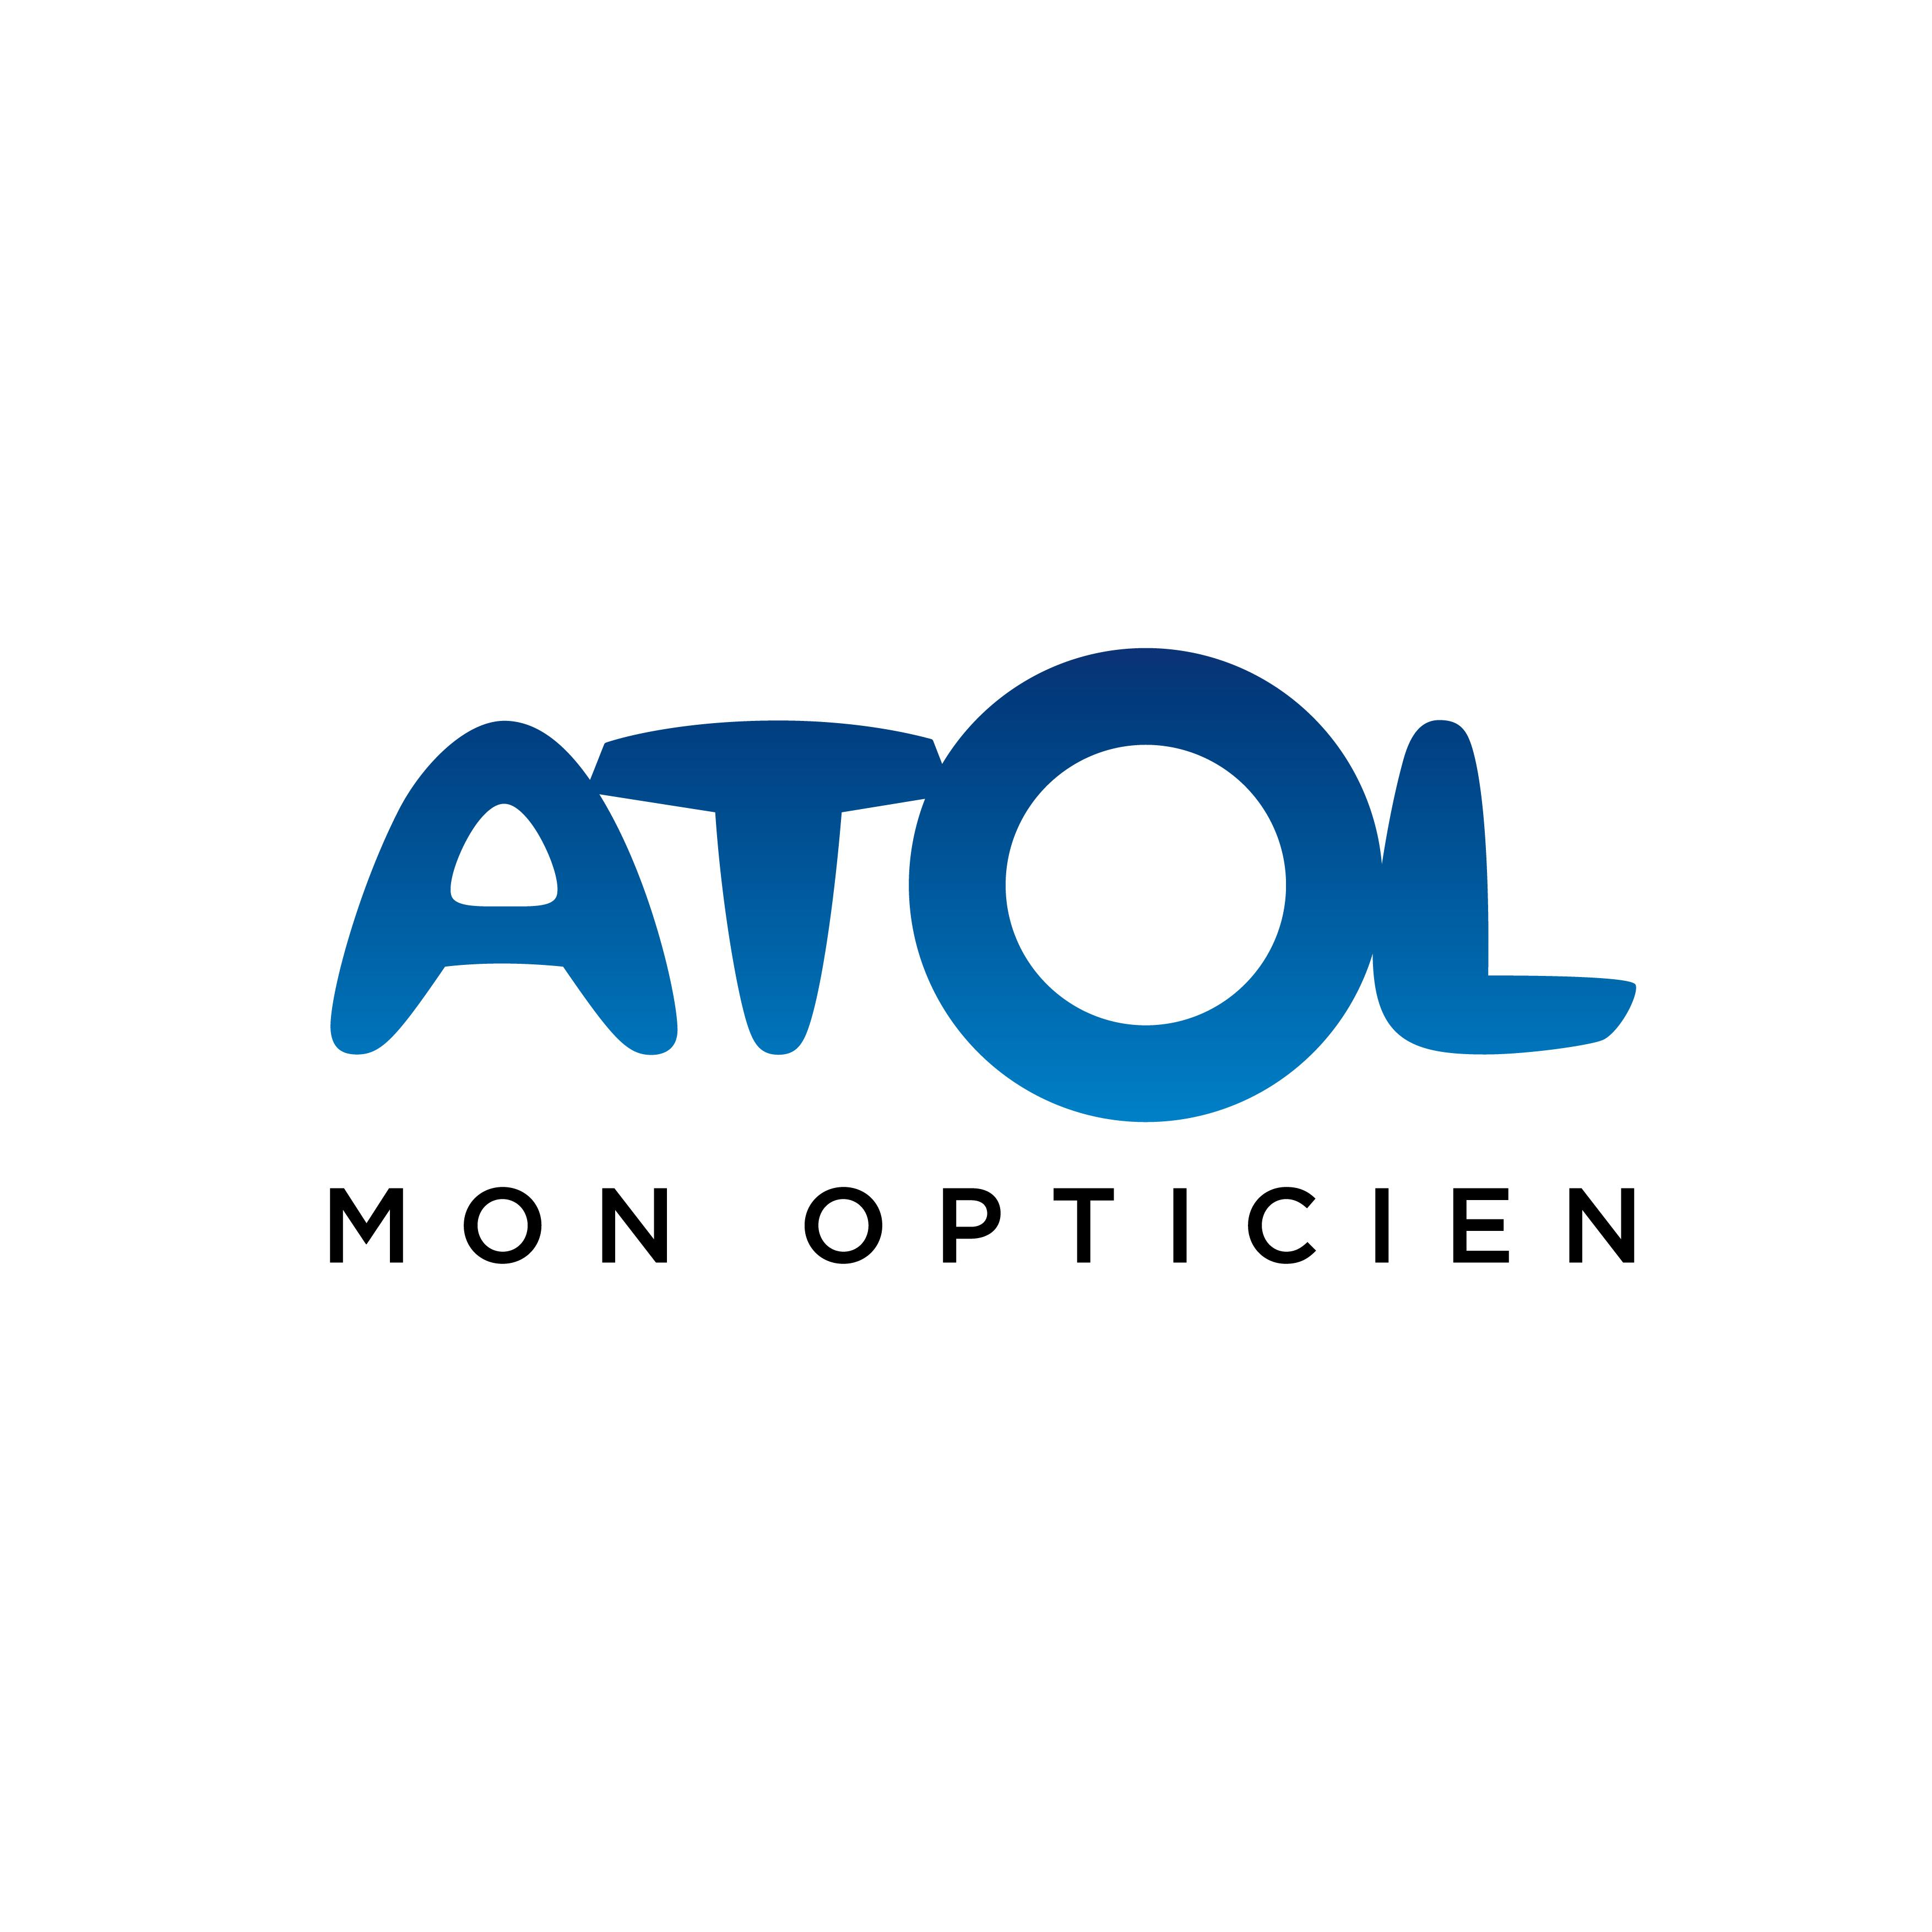 Atol Mon Opticien Bonneville